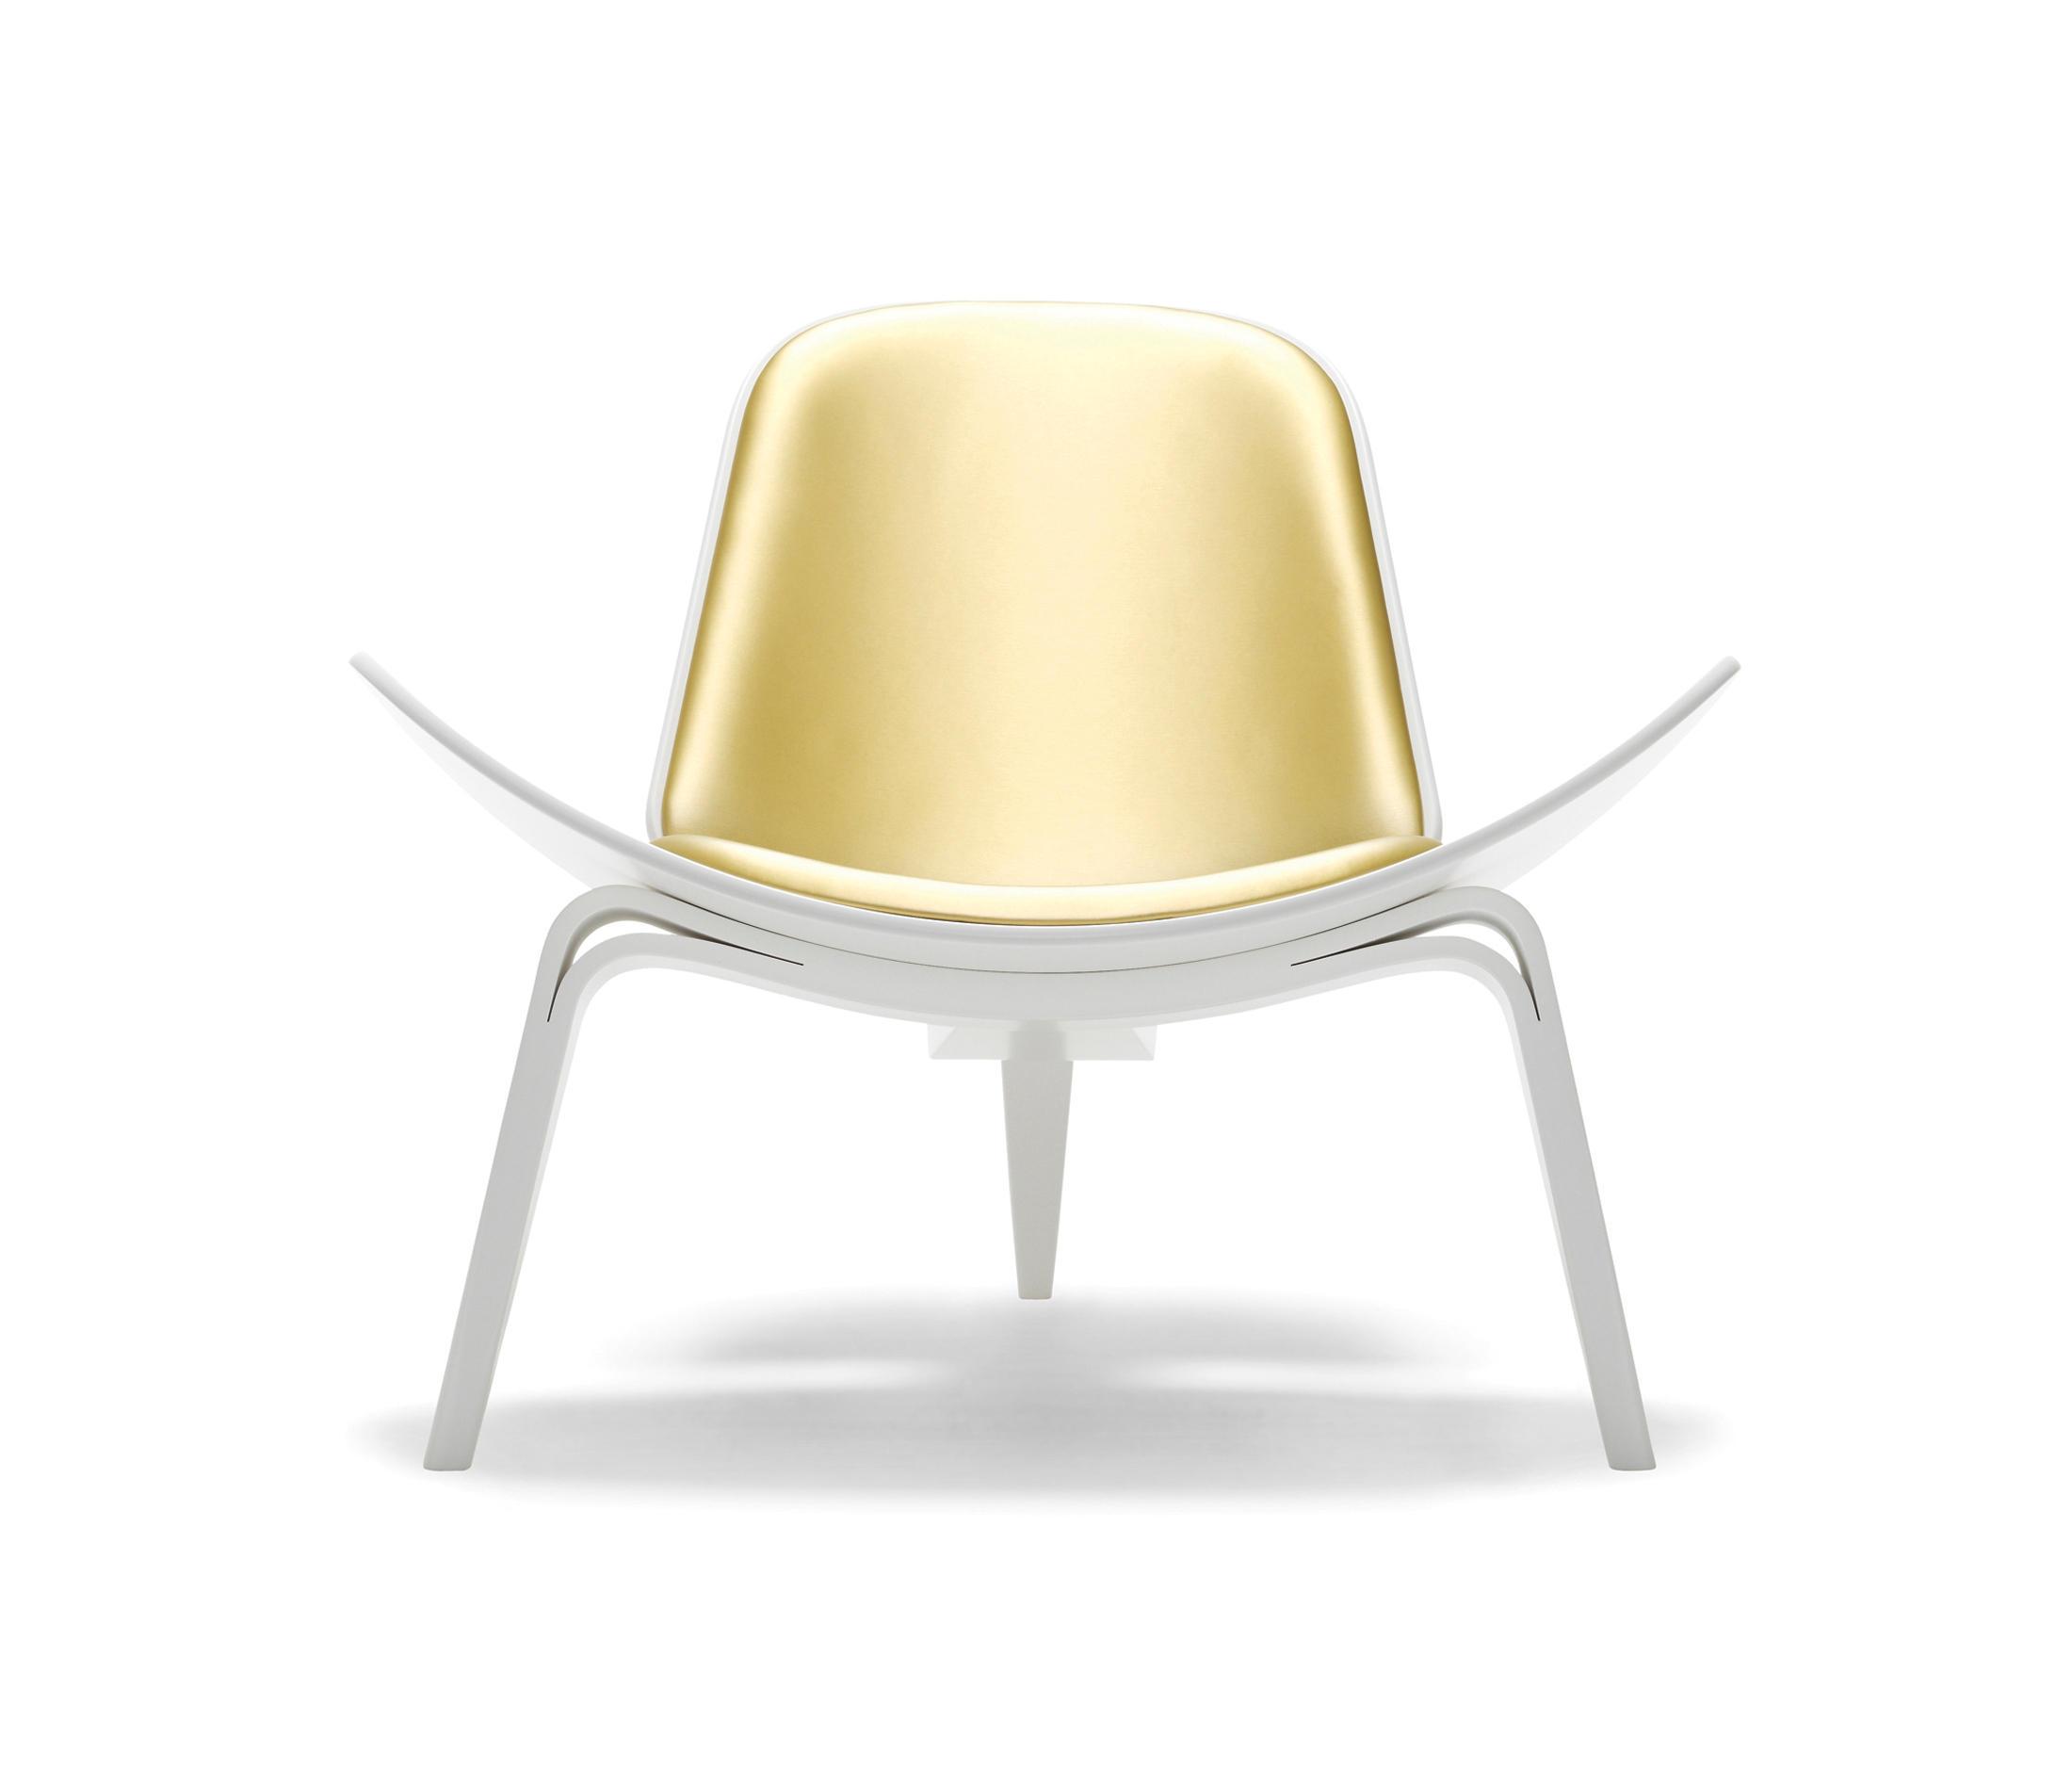 CH07 SHELL CHAIR Lounge chairs from Carl Hansen & S¸n